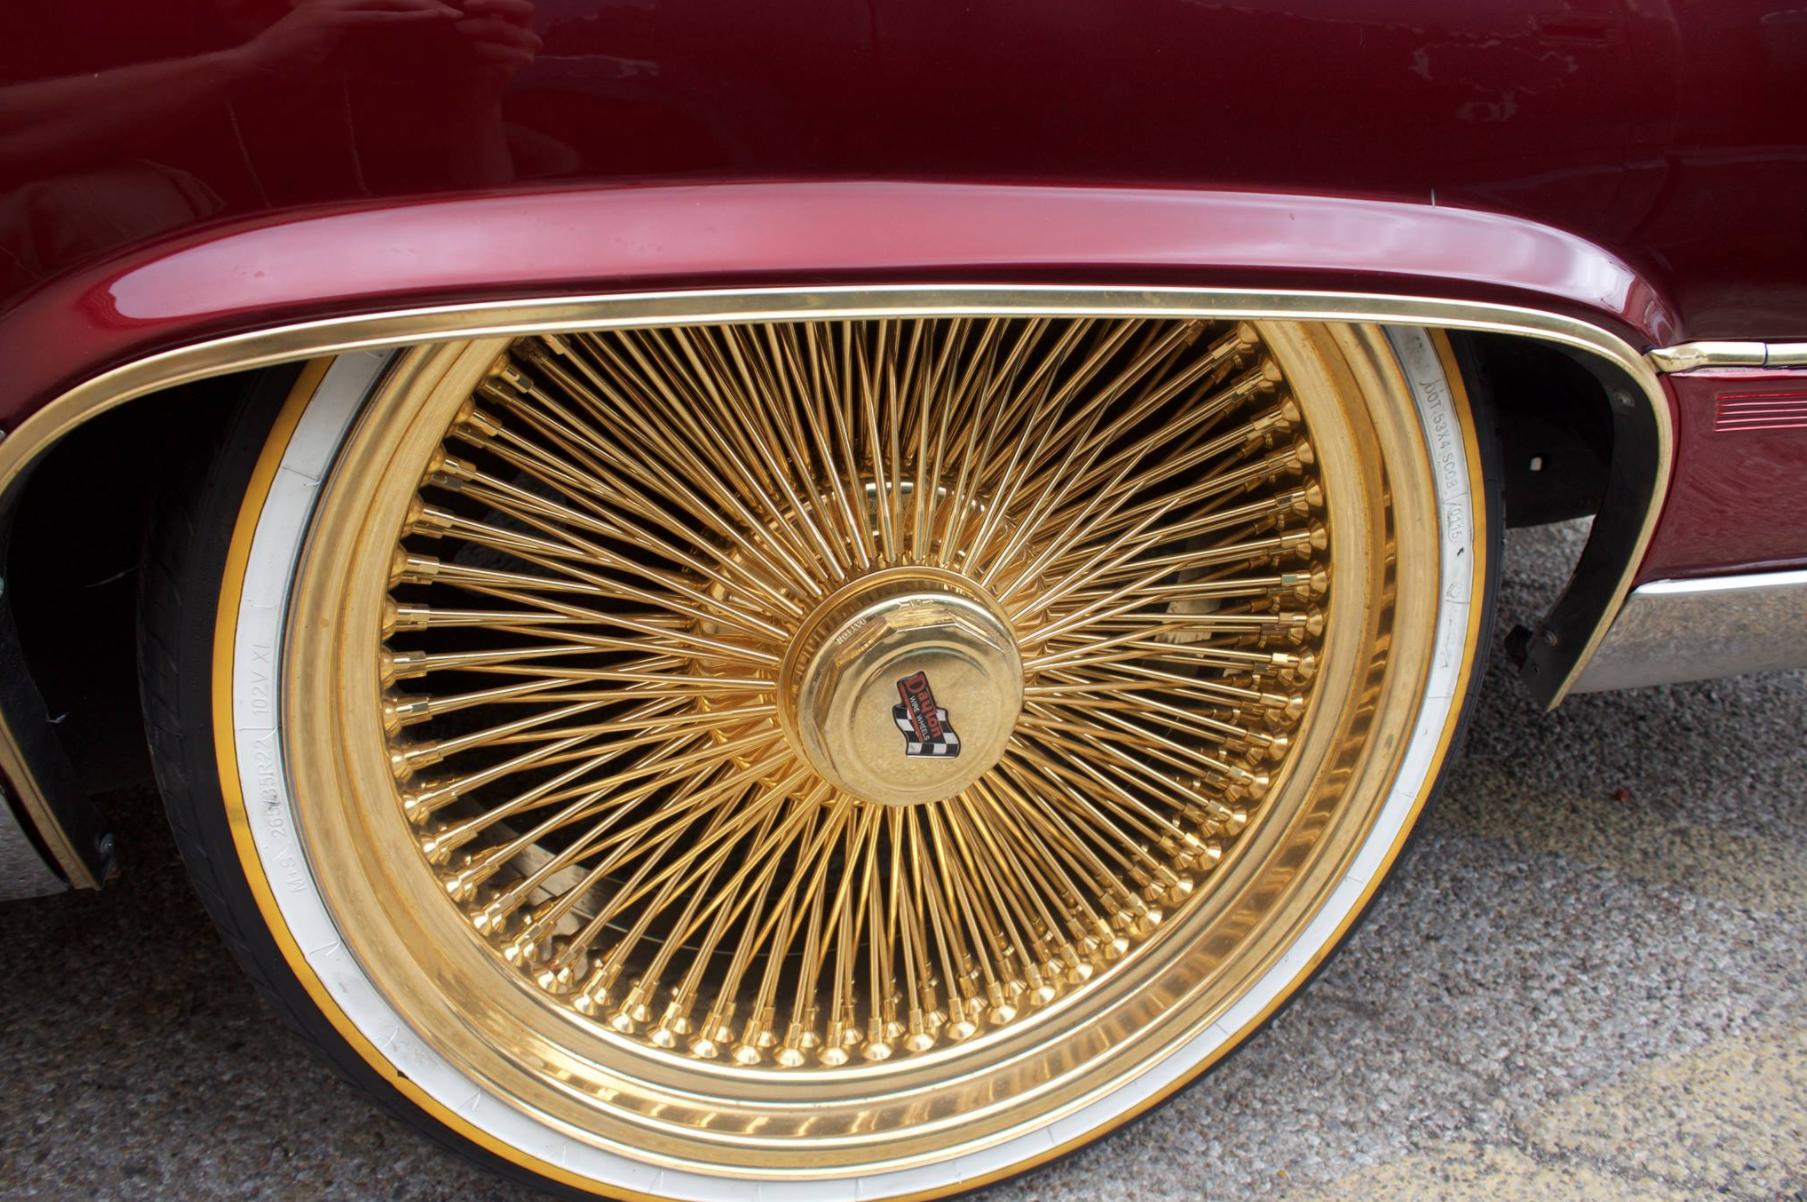 White And Gold Always Looks Good With Burgandy Dayton Wheels Dayton Rims Wheel Rims